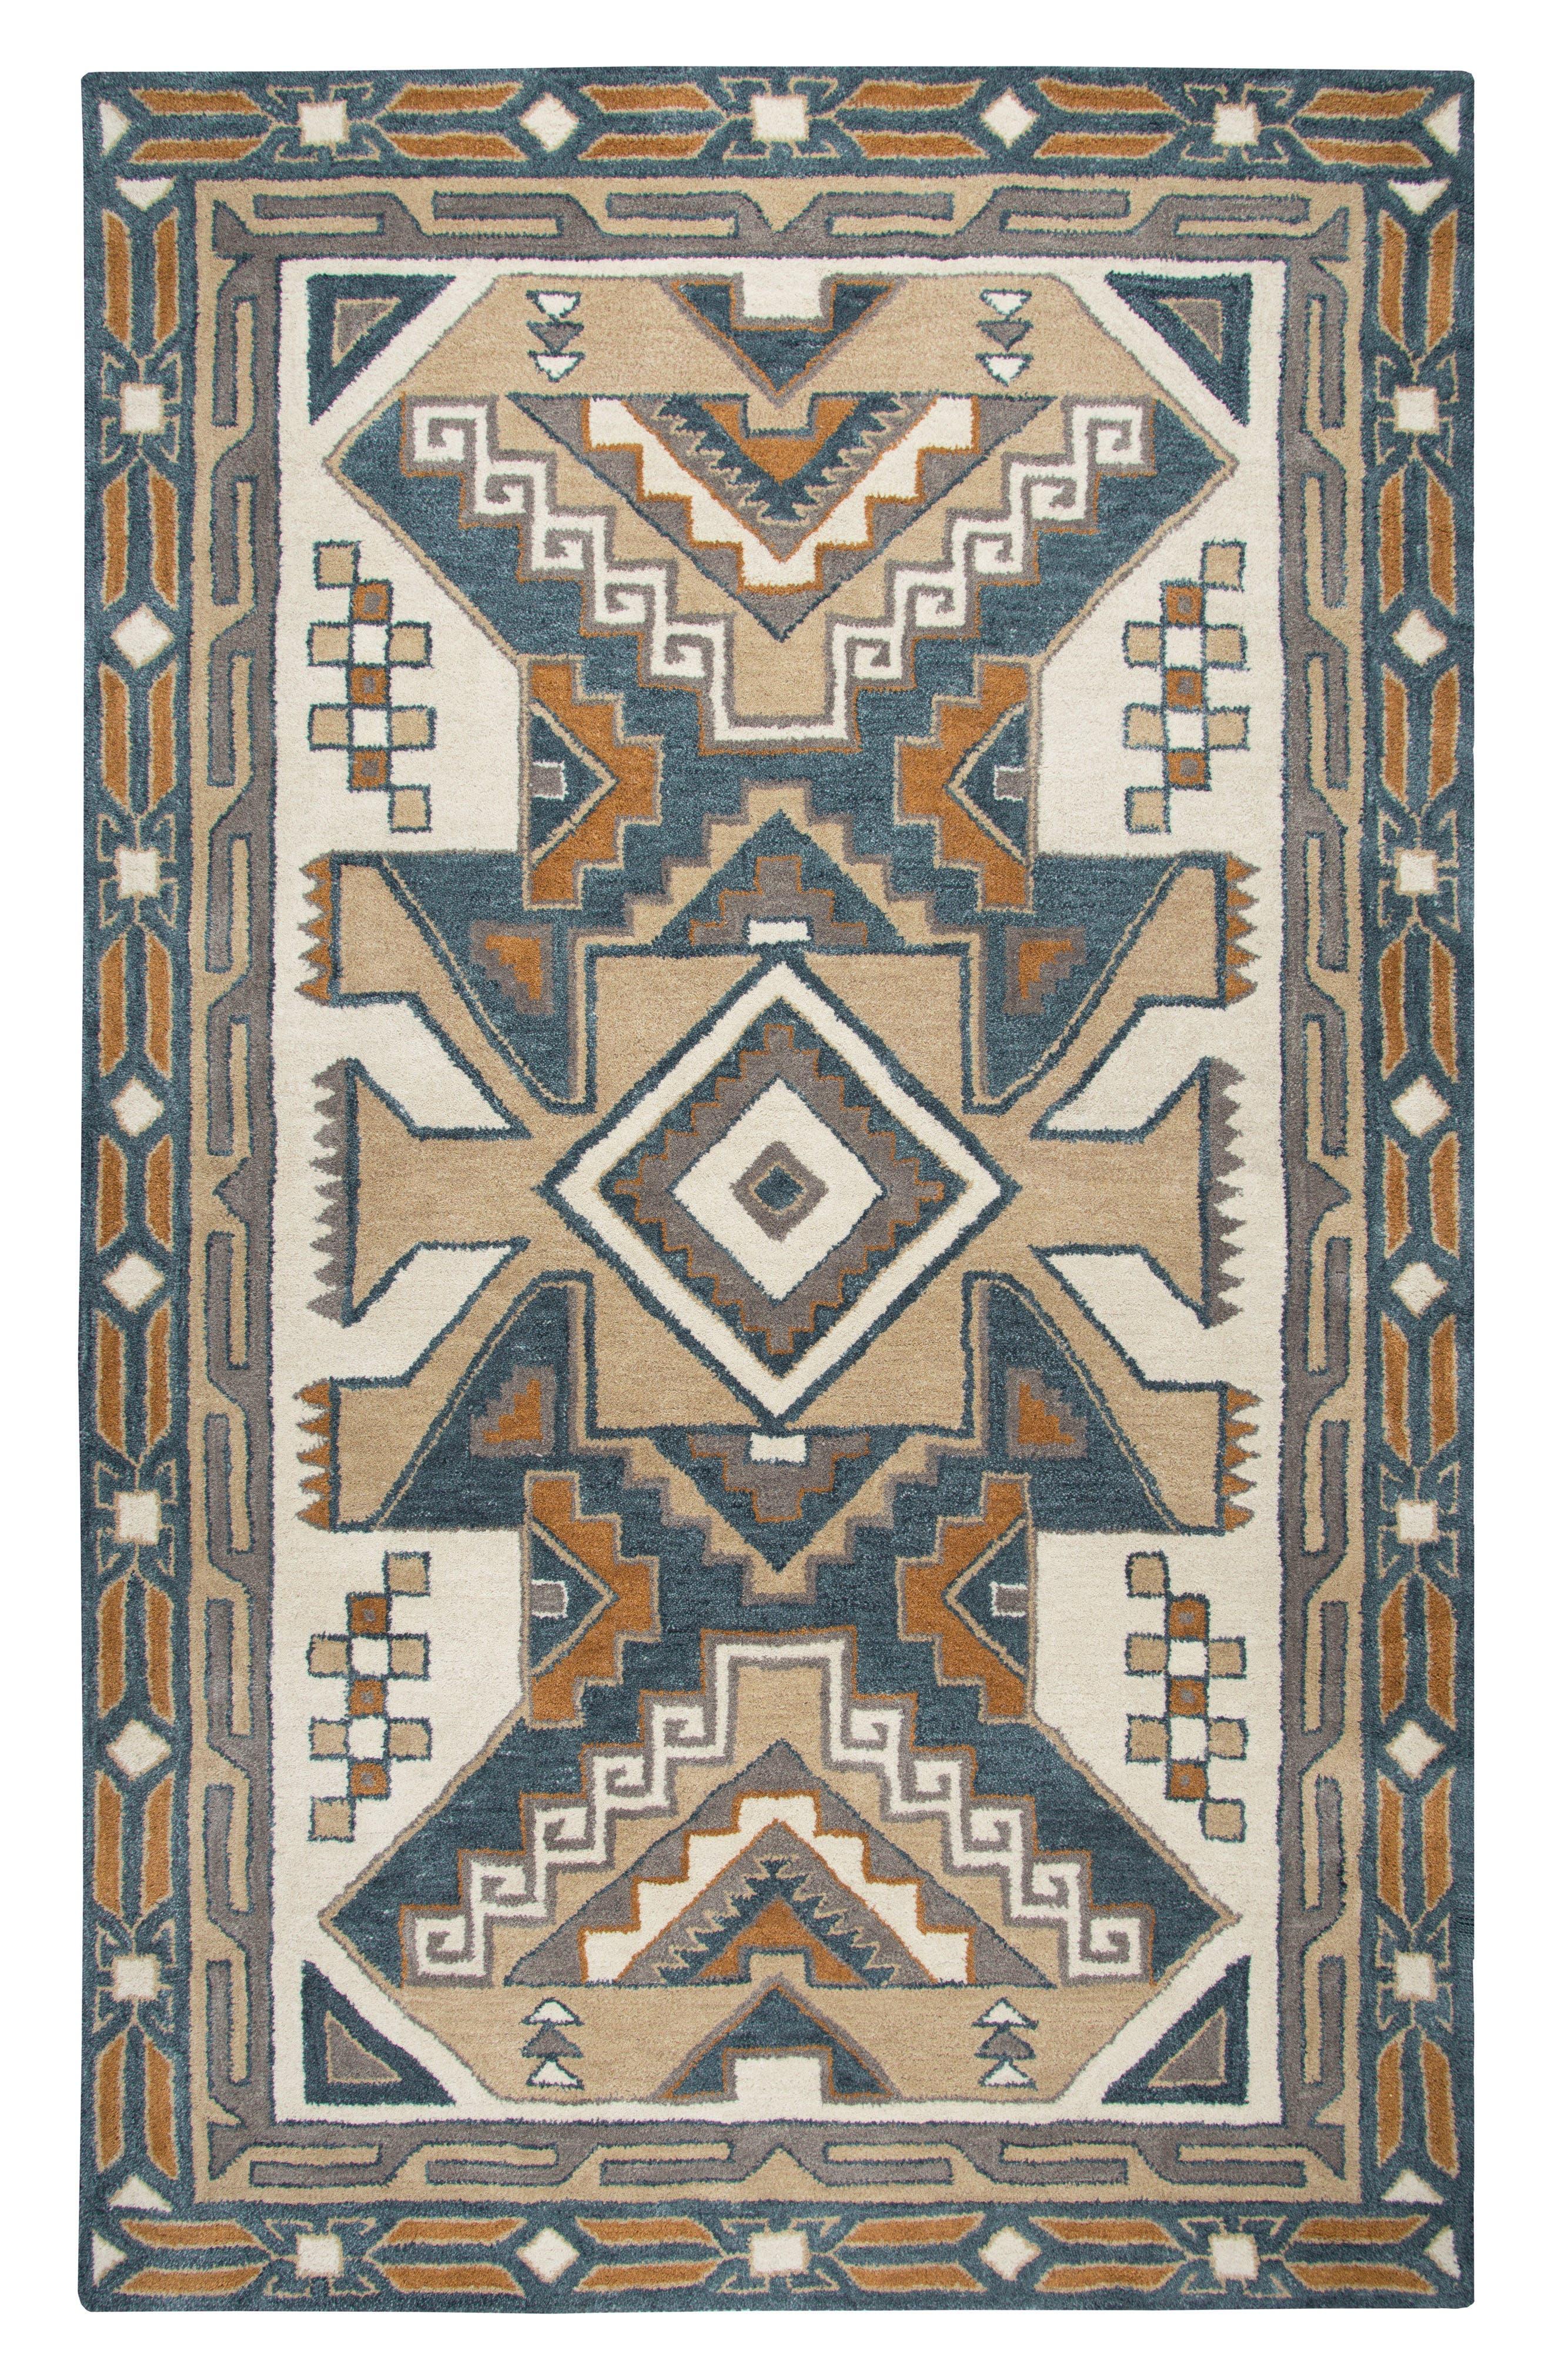 Urban Tiles Hand Tufted Wool Rug,                             Main thumbnail 1, color,                             220